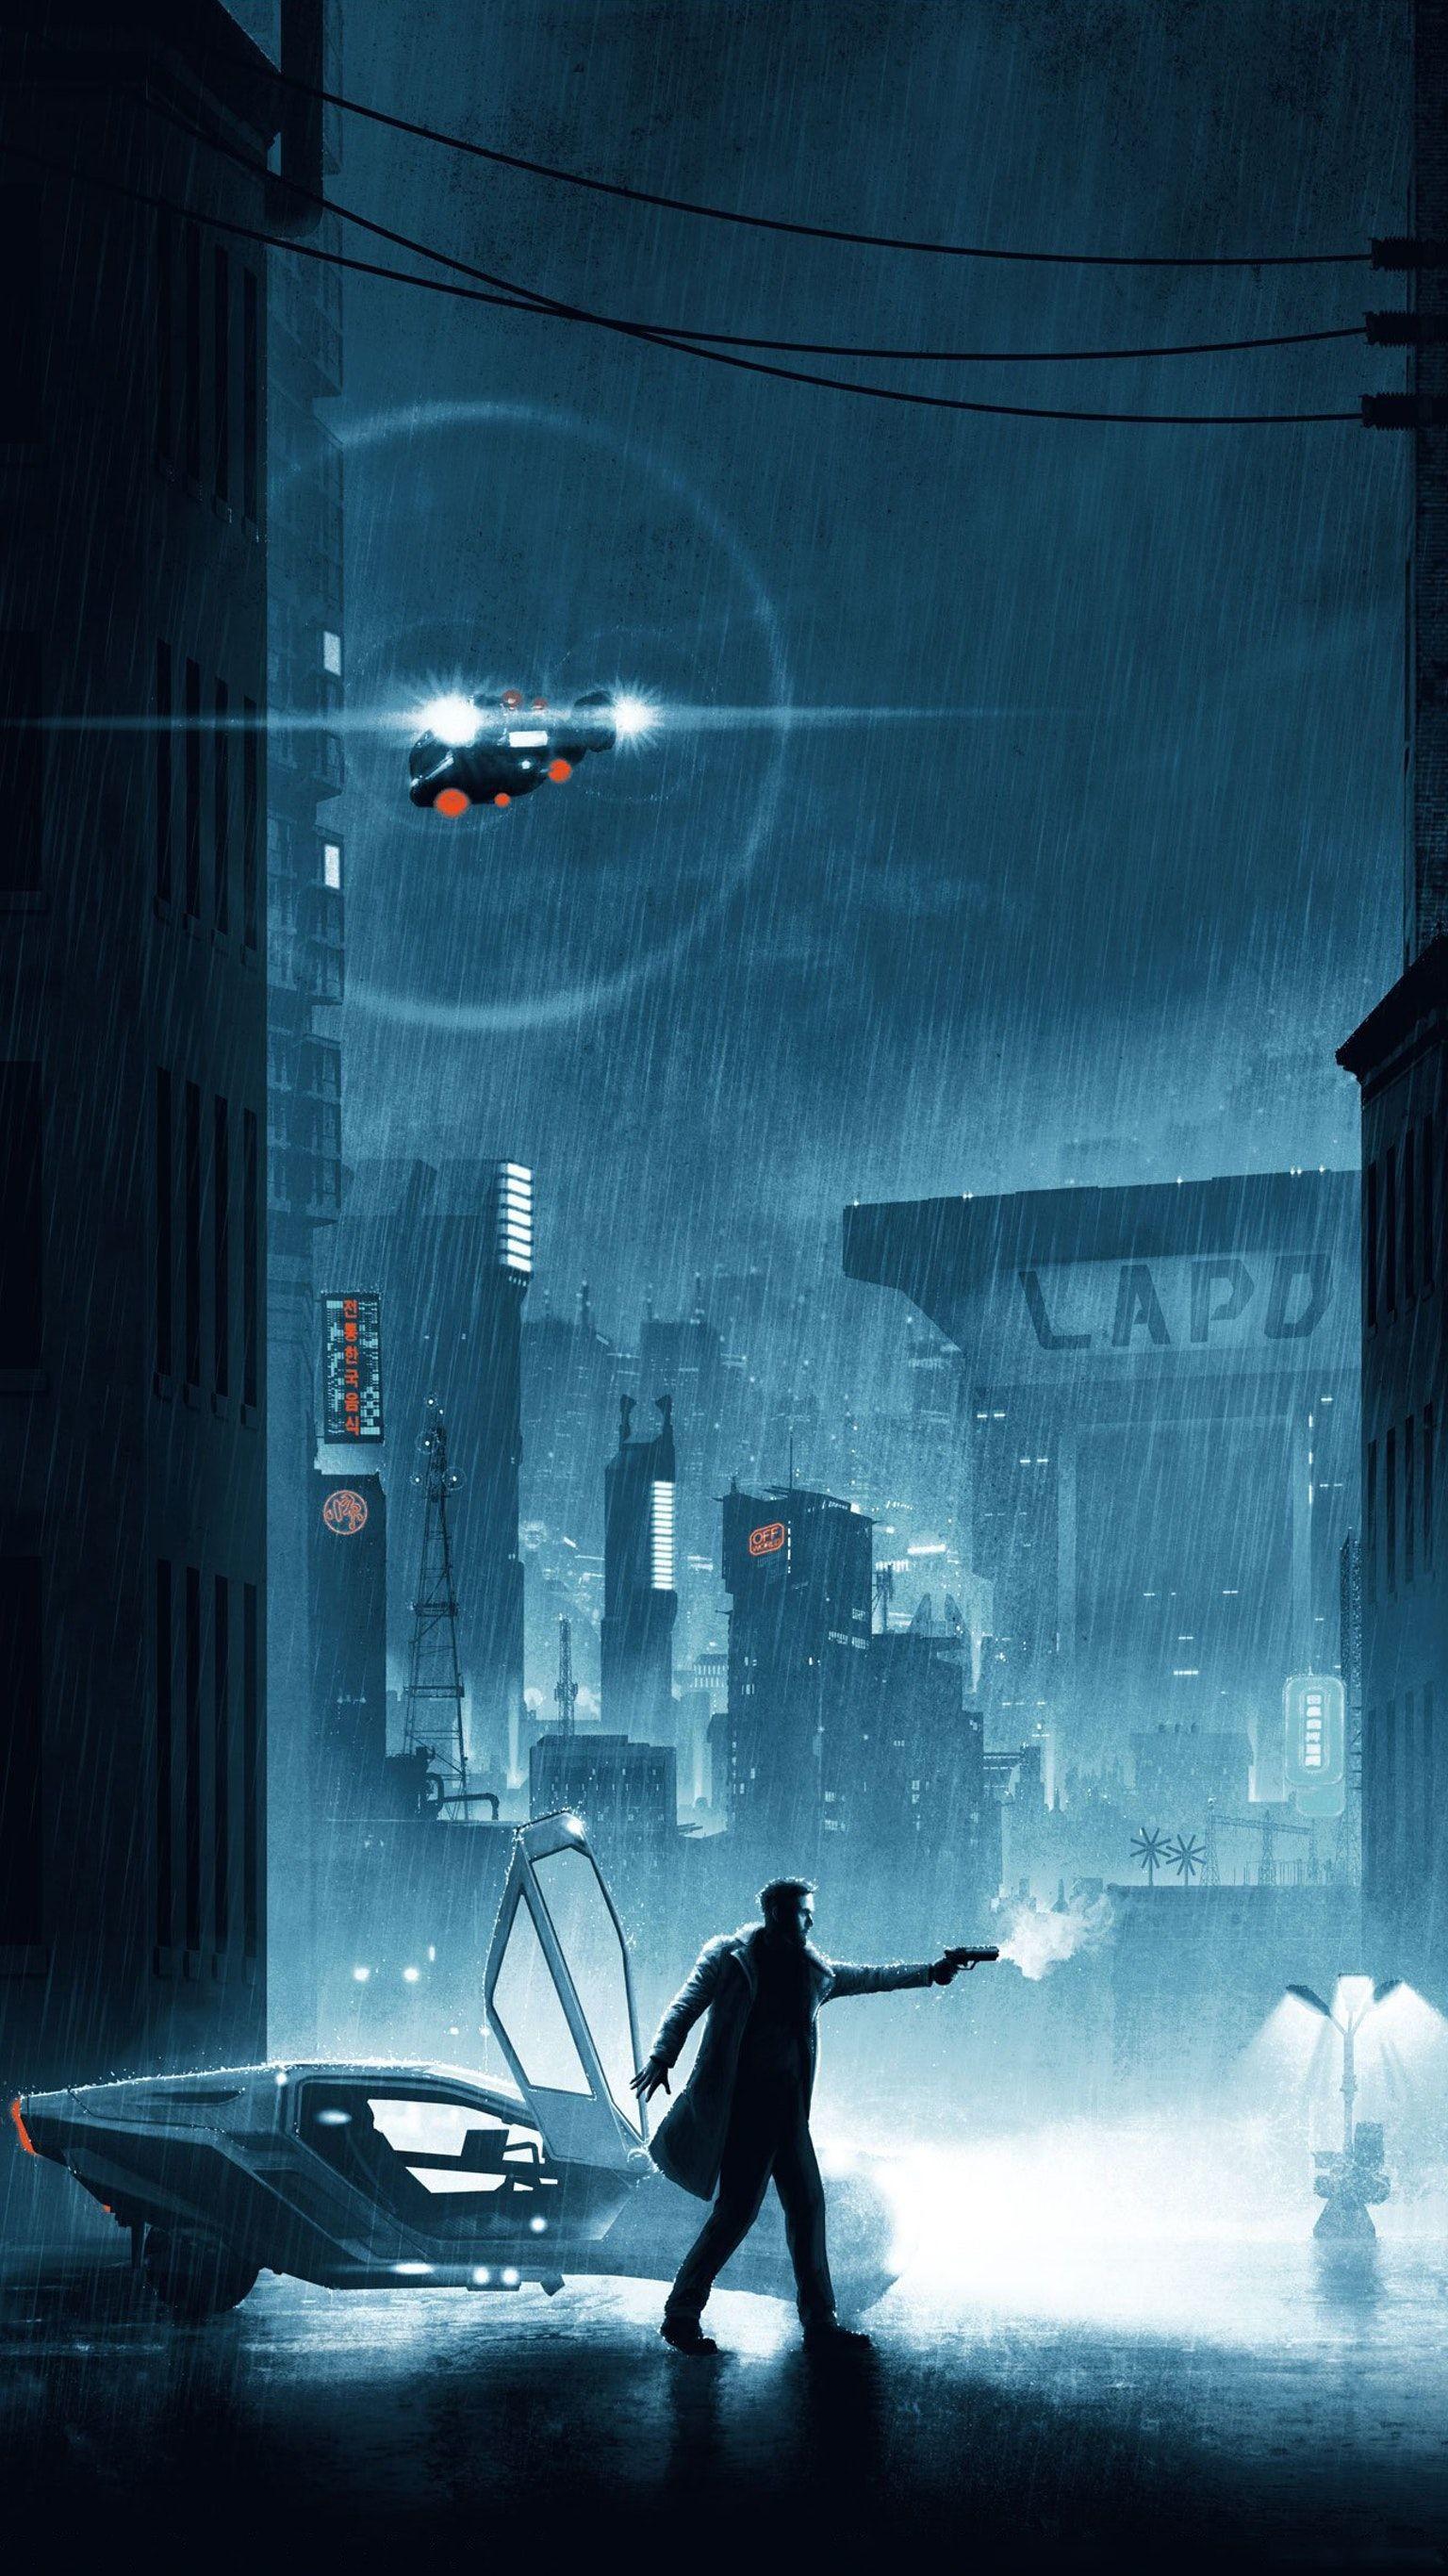 Res: 1536x2732, Blade Runner 2049 (2017) Phone Wallpaper | Moviemania